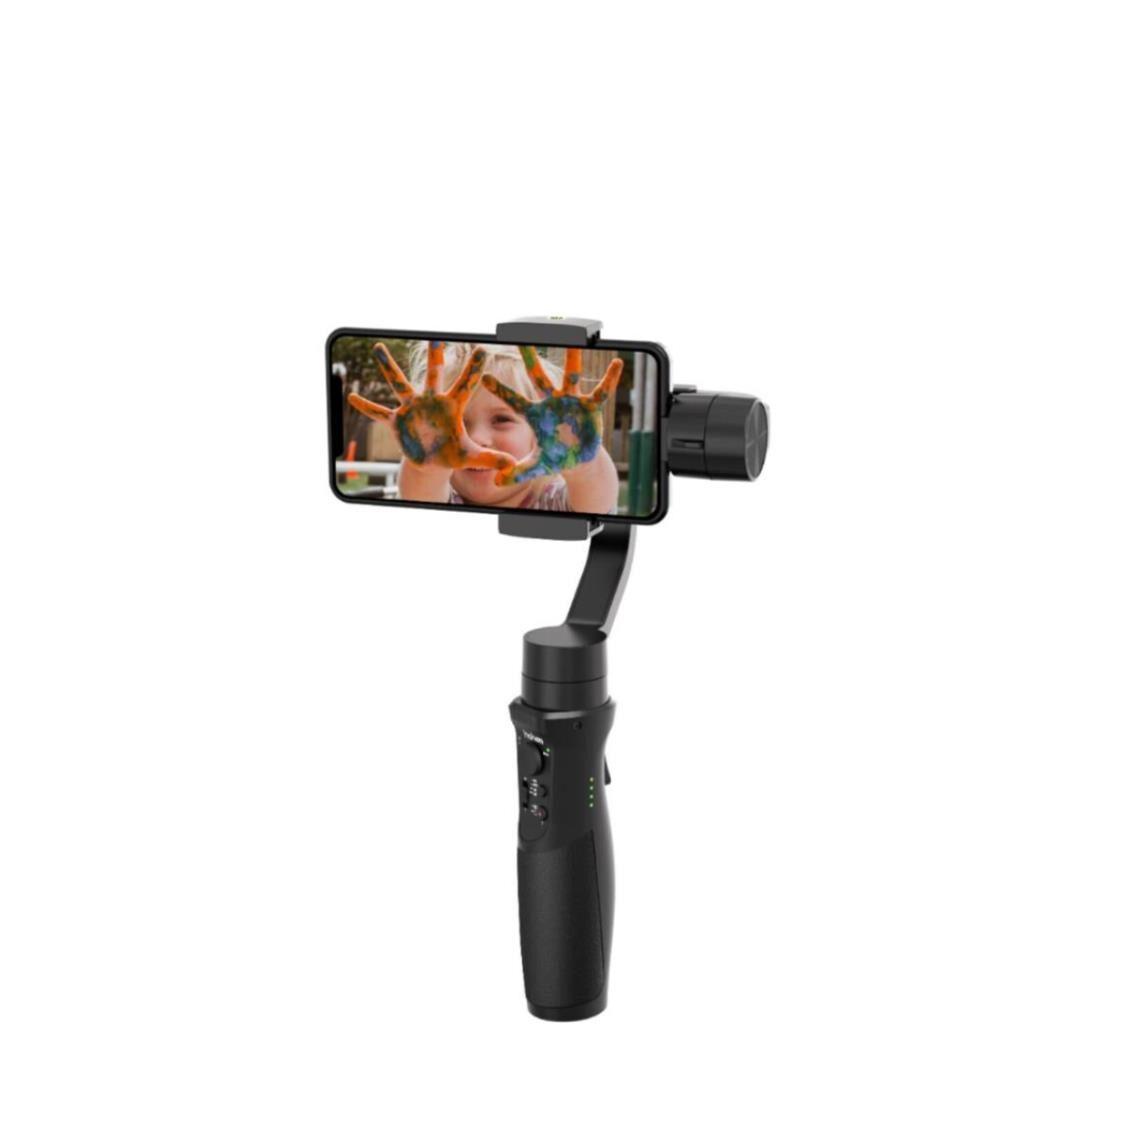 Hohem iSteady Mobile Plus 3-Axis Handheld Smartphone Gimbal